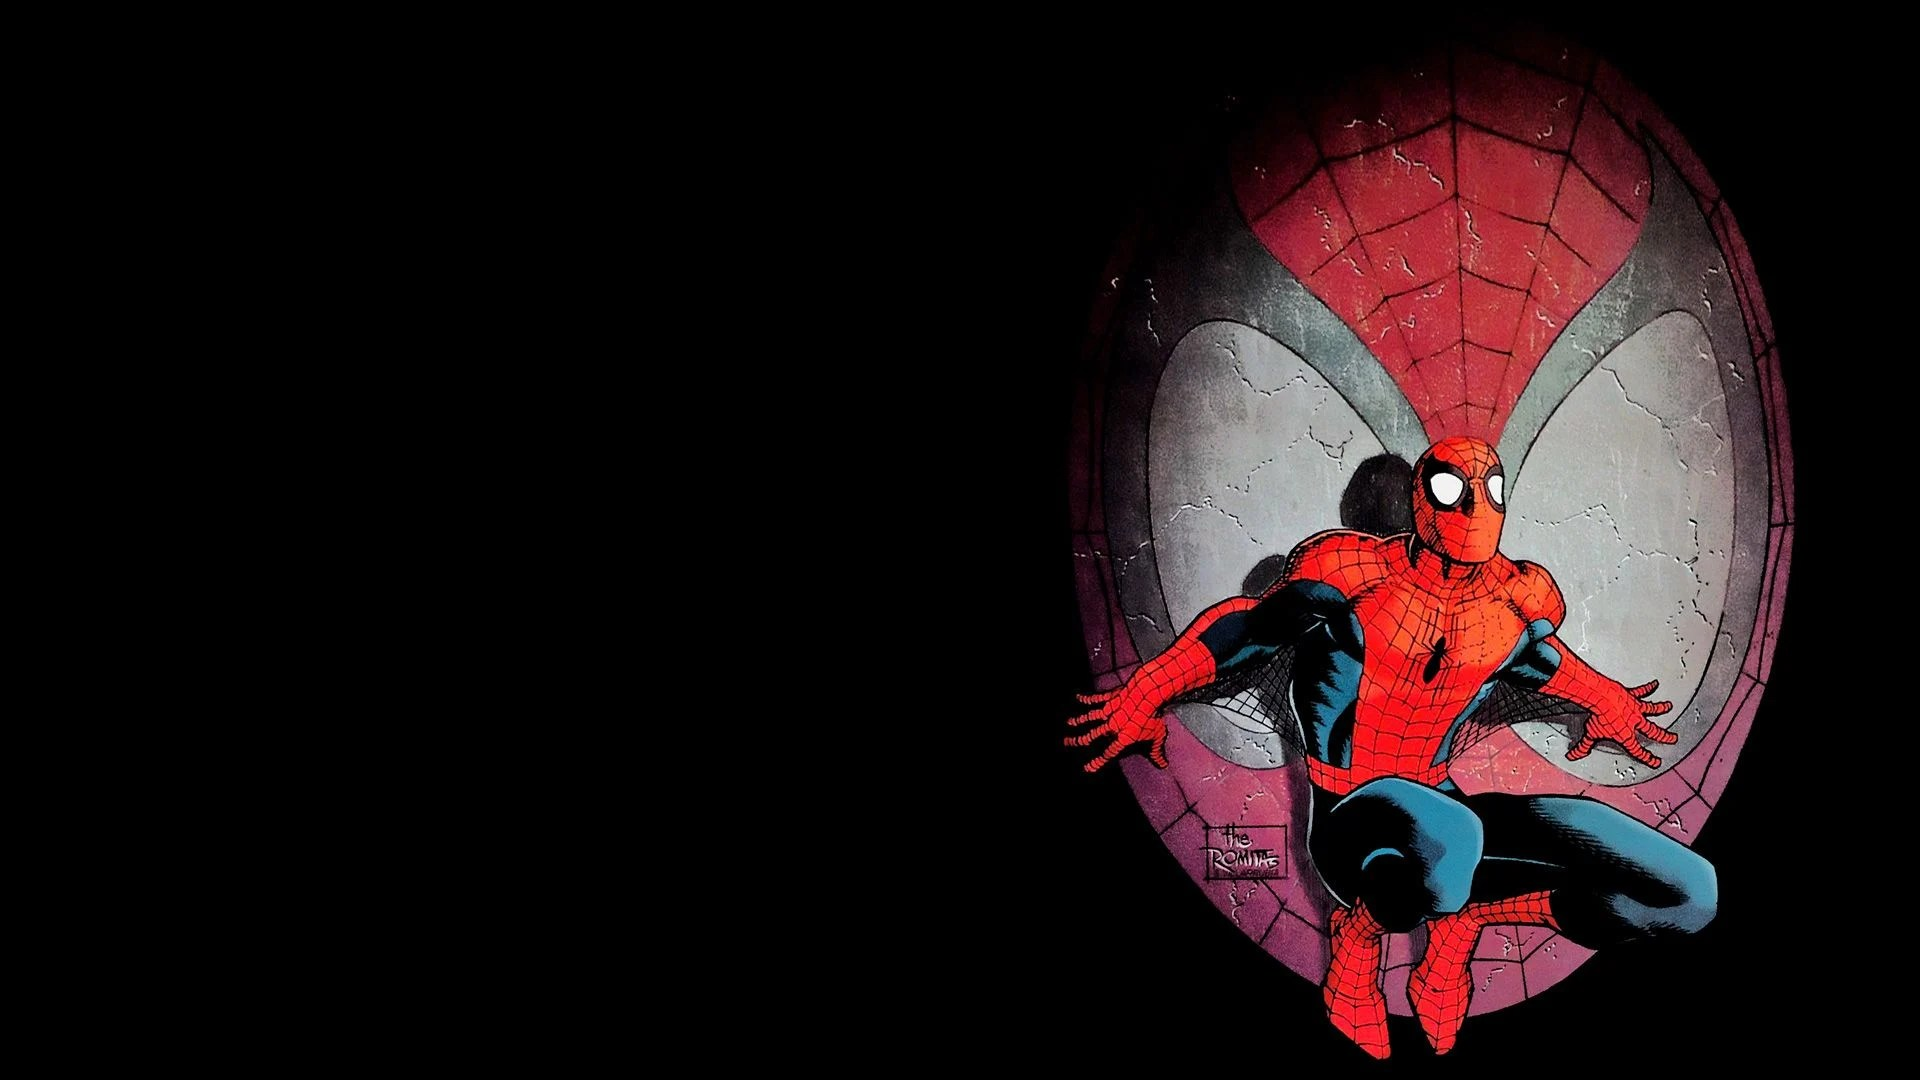 spider man wallpapers top